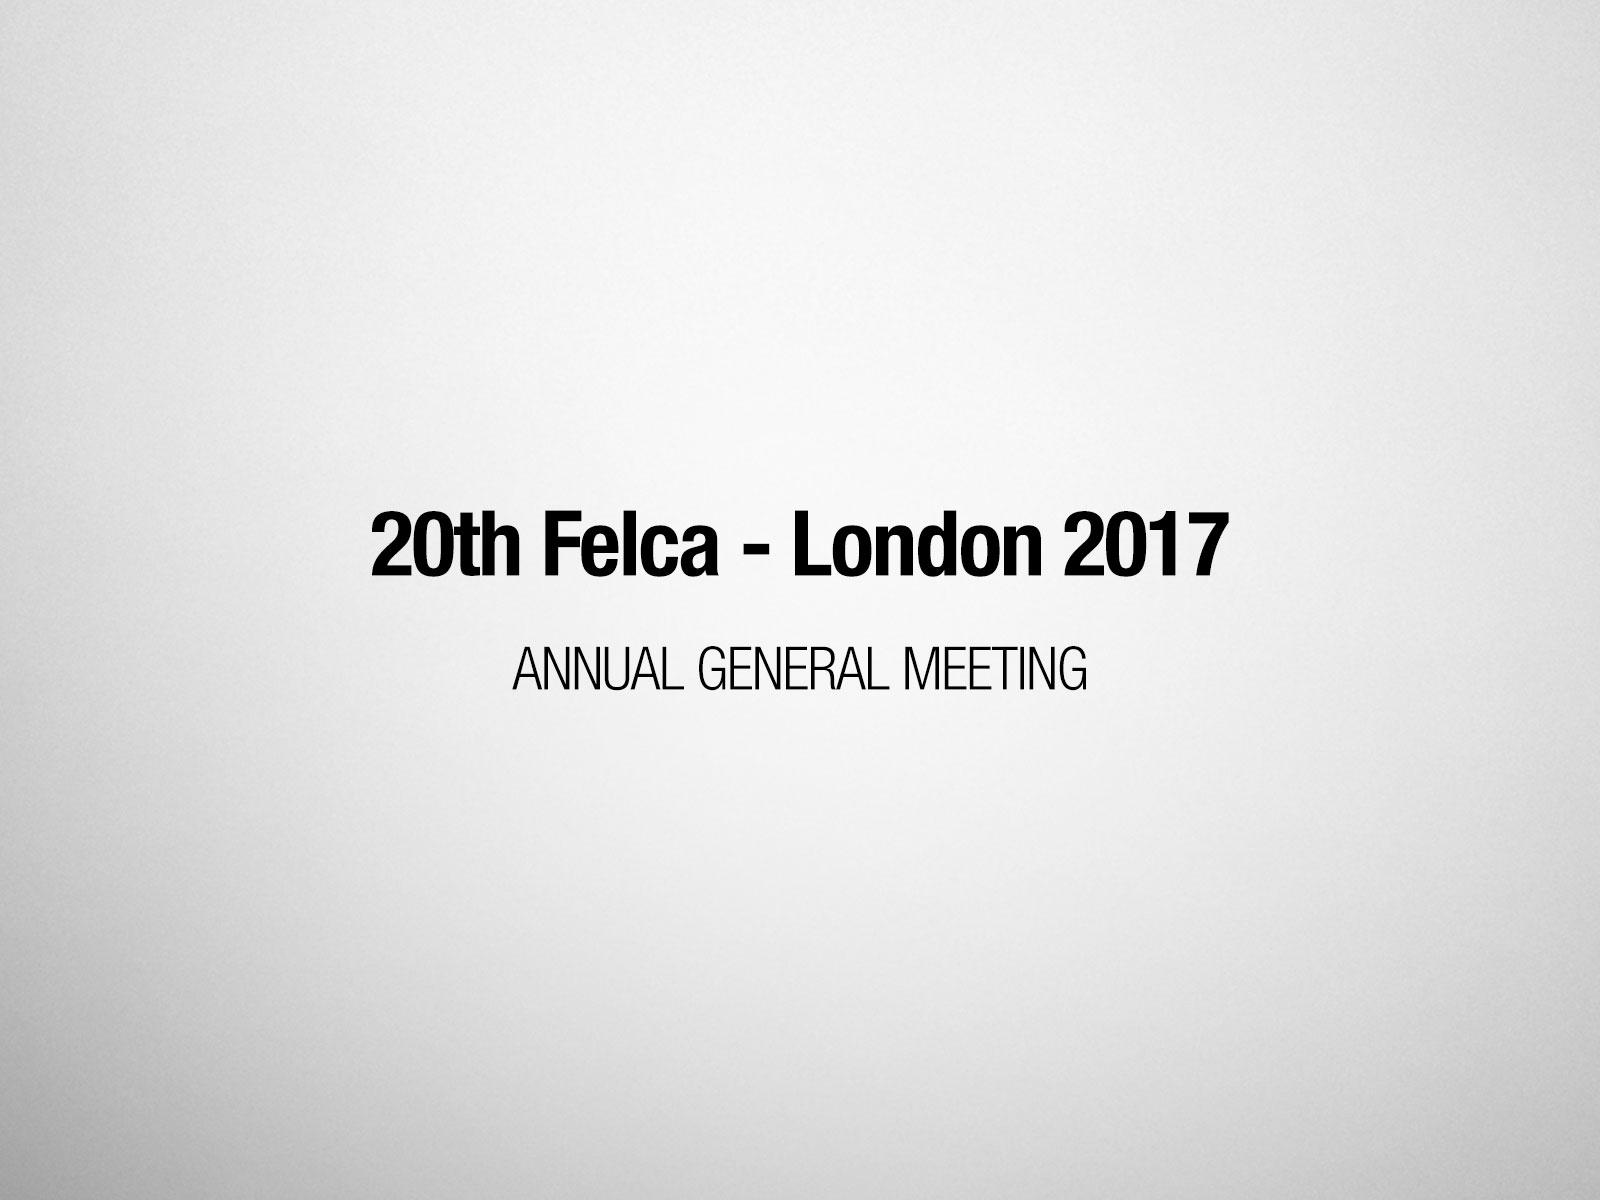 20th FELCA AGM – London 2017